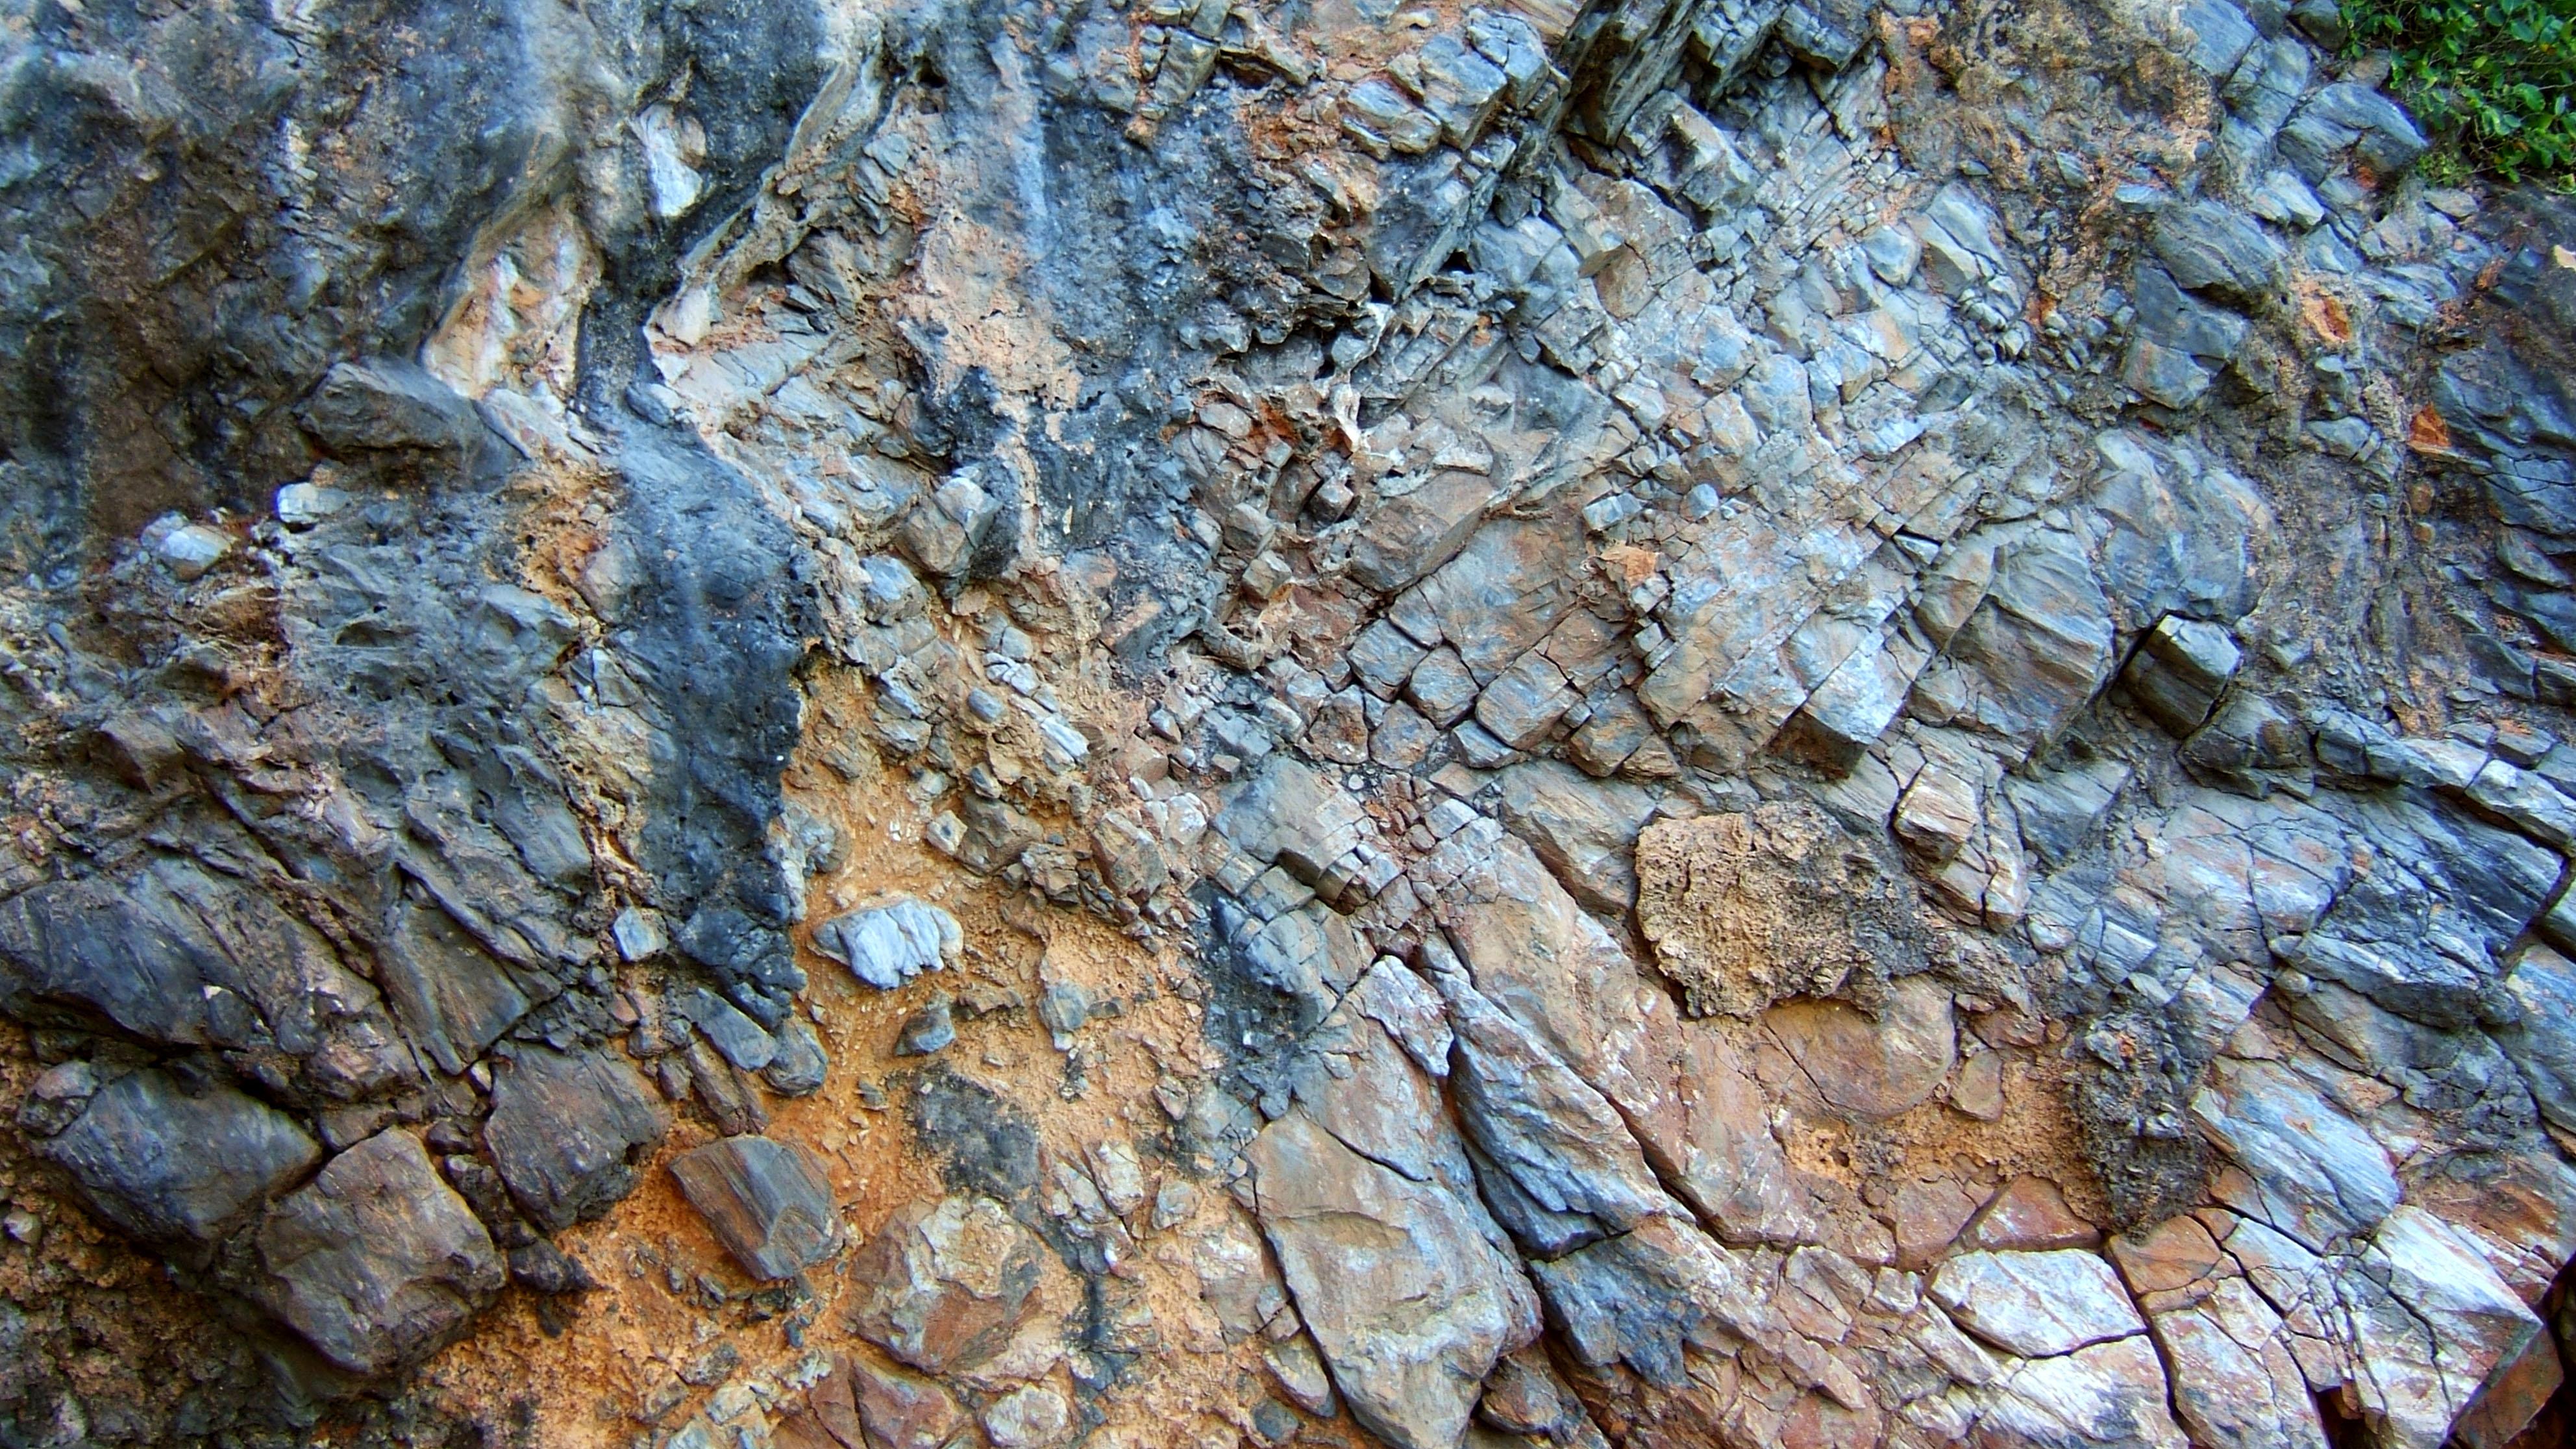 Textures Rocks Stones Pebbles Philippines Mindoro White Beach 02